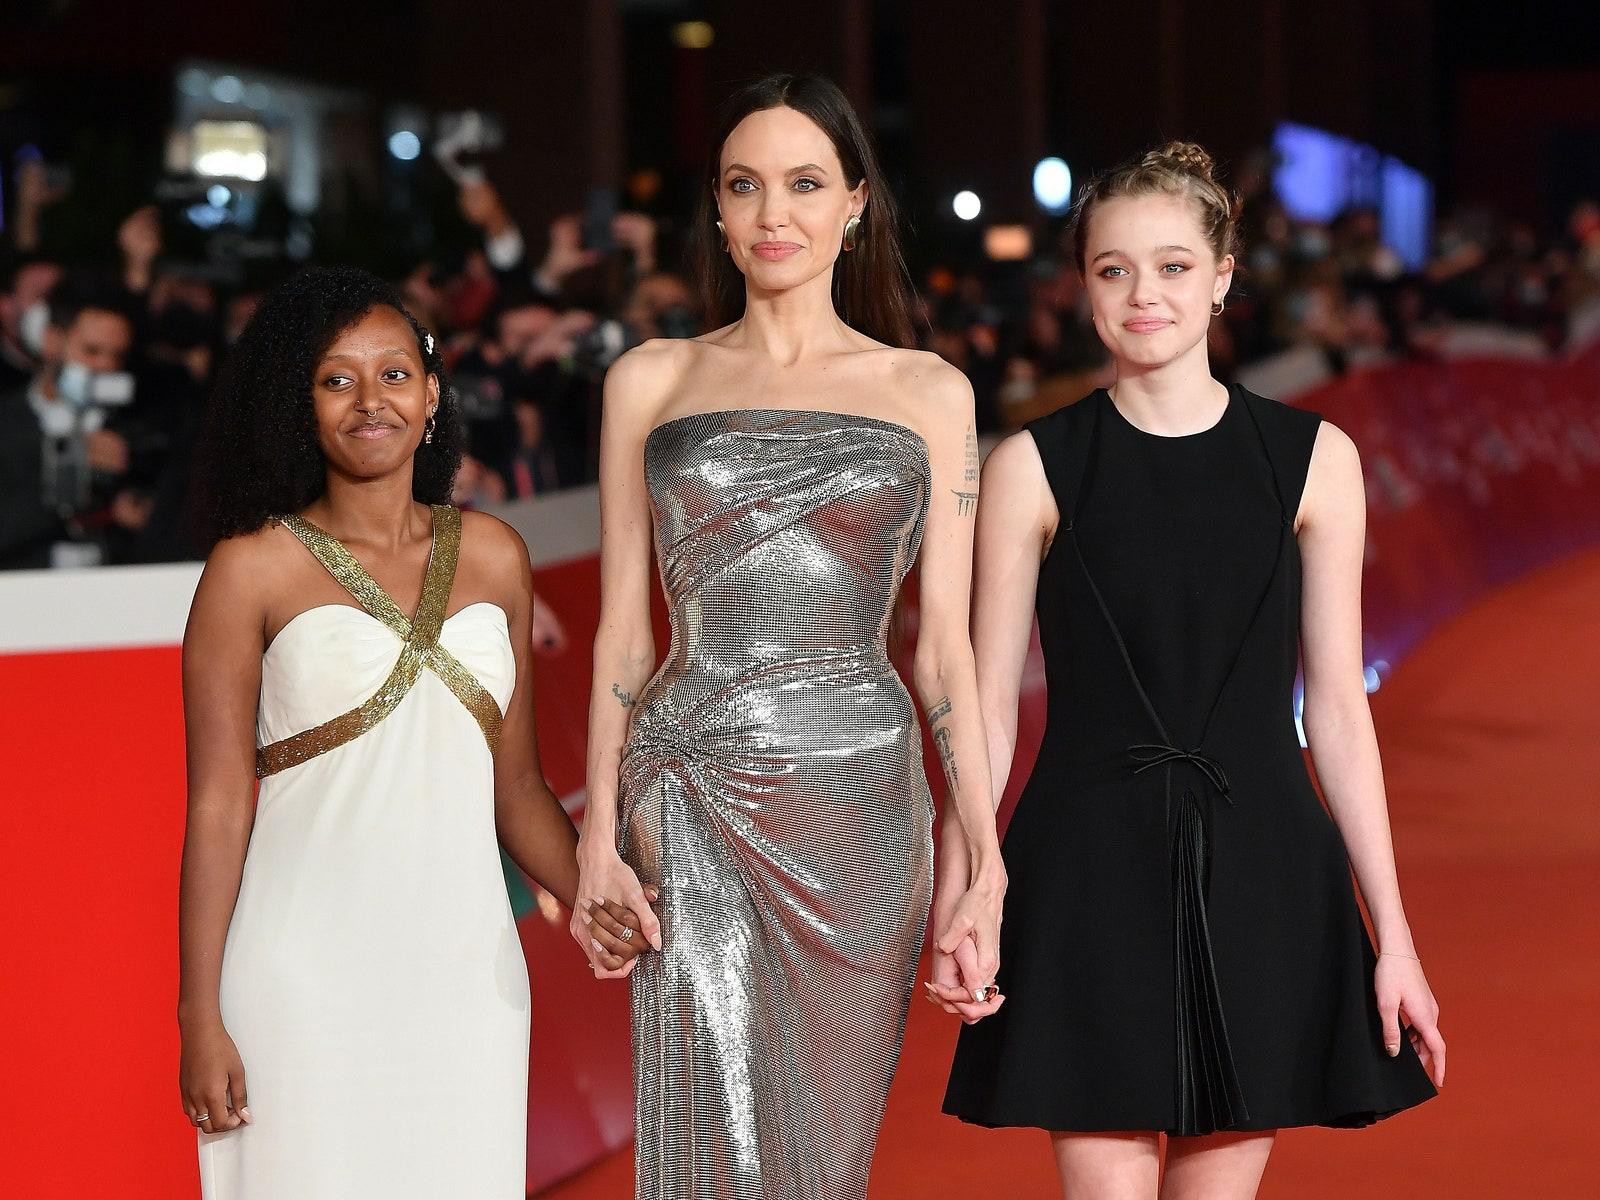 ROME ITALY  OCTOBER 24  Zahara Marley JoliePitt Angelina Jolie and Shiloh JoliePitt attend the red carpet of the movie...